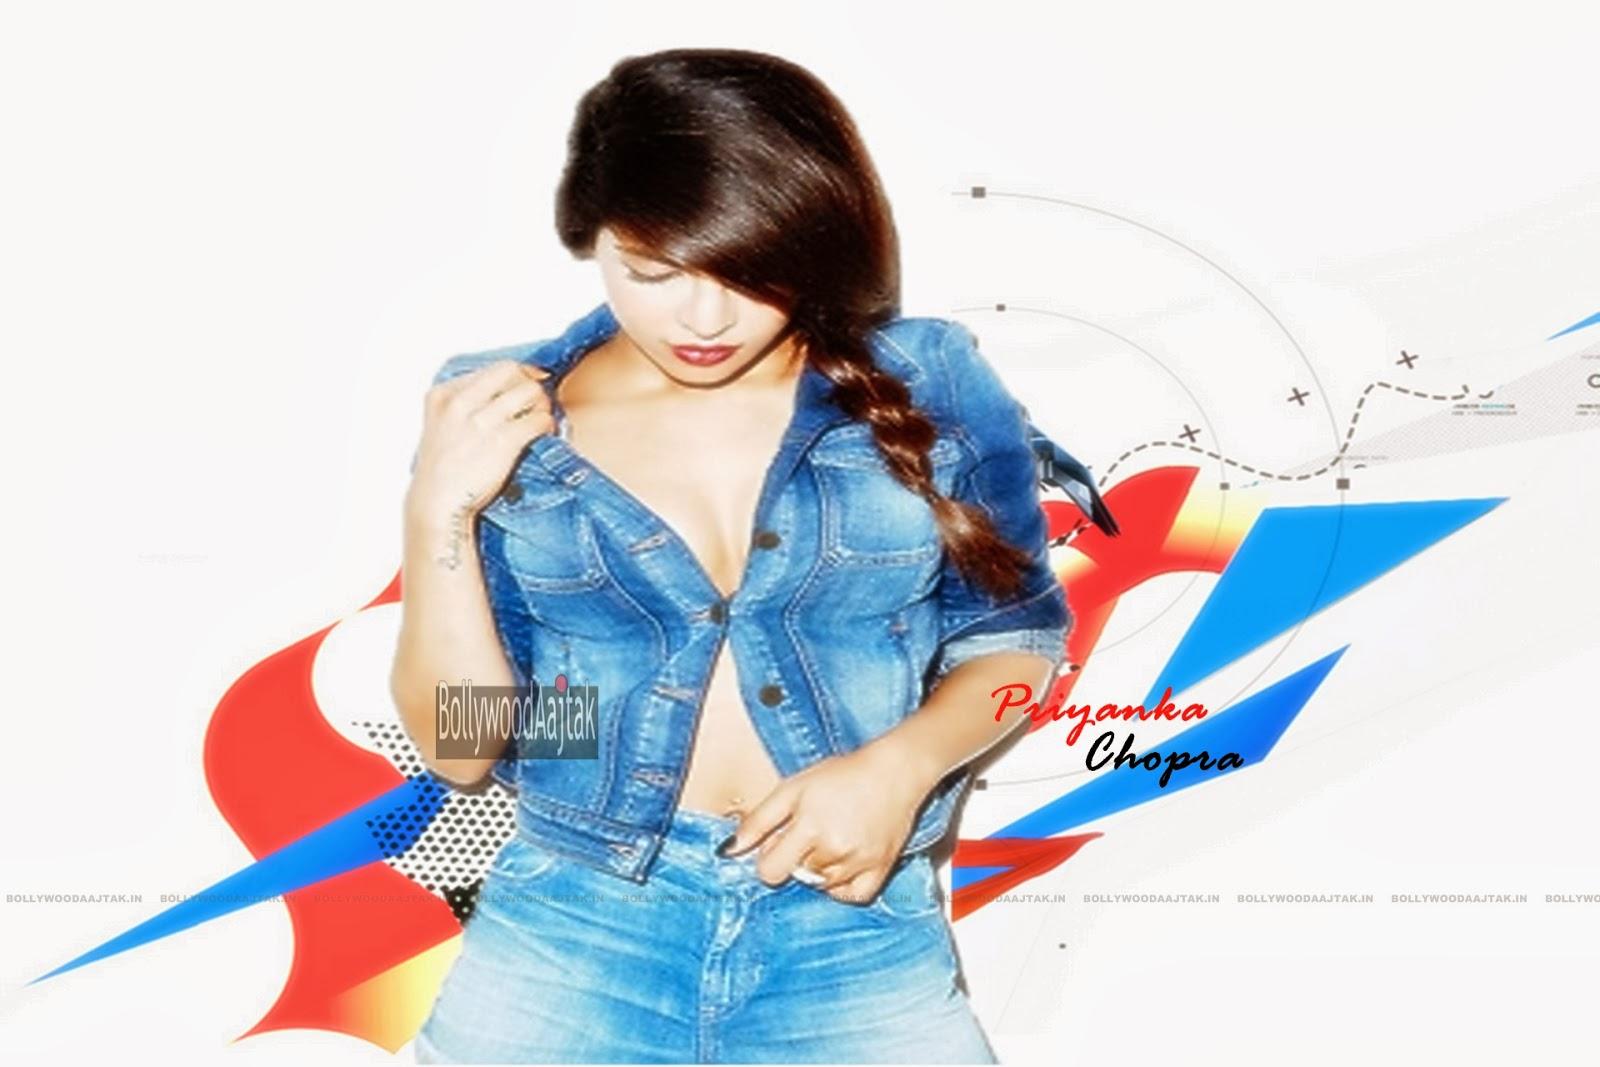 Hq Hot Wallpapers Priyanka Chopra Wallpapers-9853